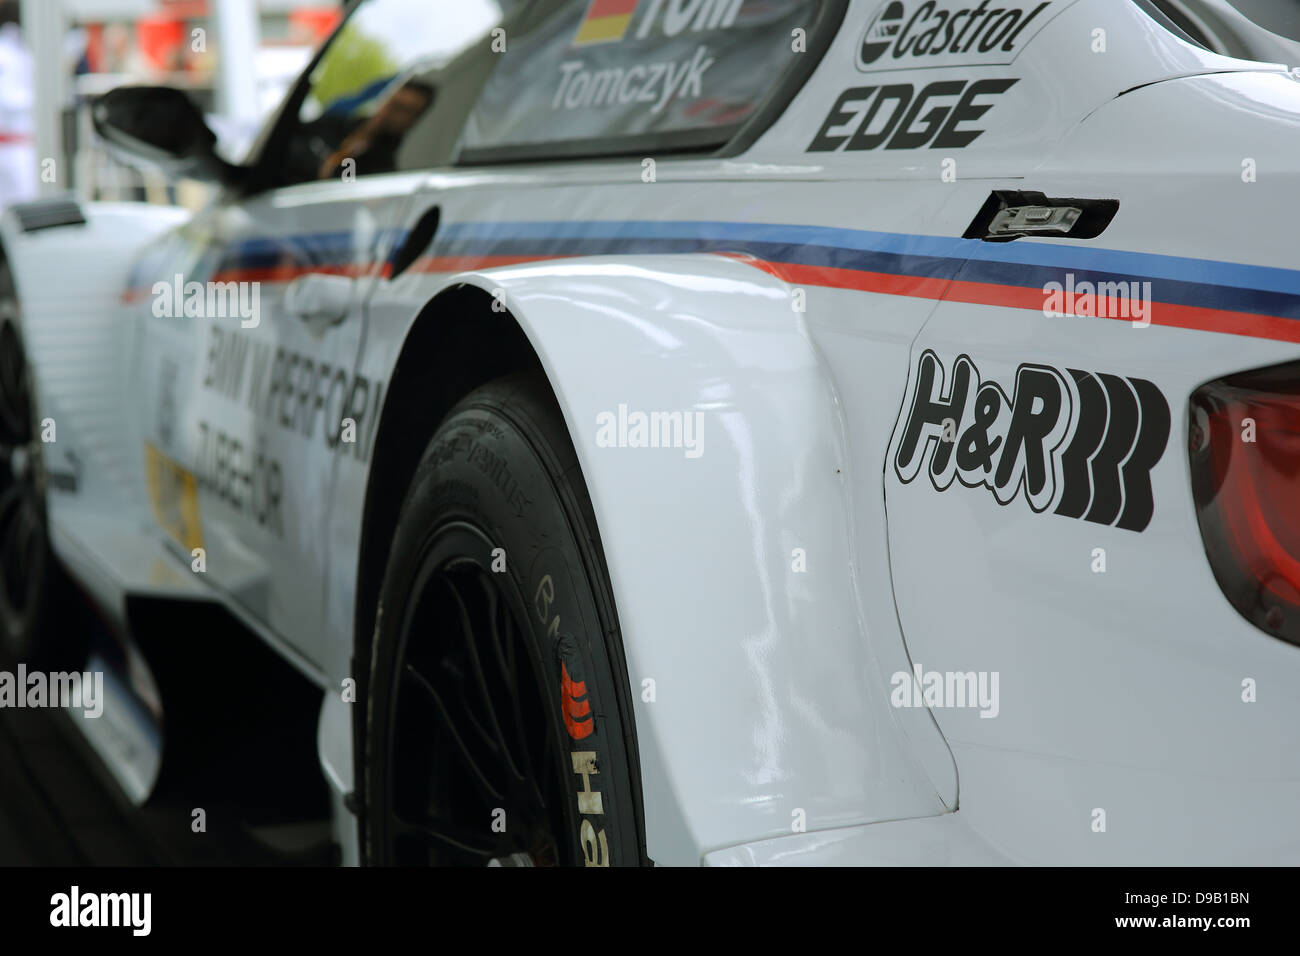 Deutsche Tourenwagon Masters. DTM Touring Car series. Round 2. Brands Hatch Circuit, Kent, UK. June 18/19 2013 - Stock Image